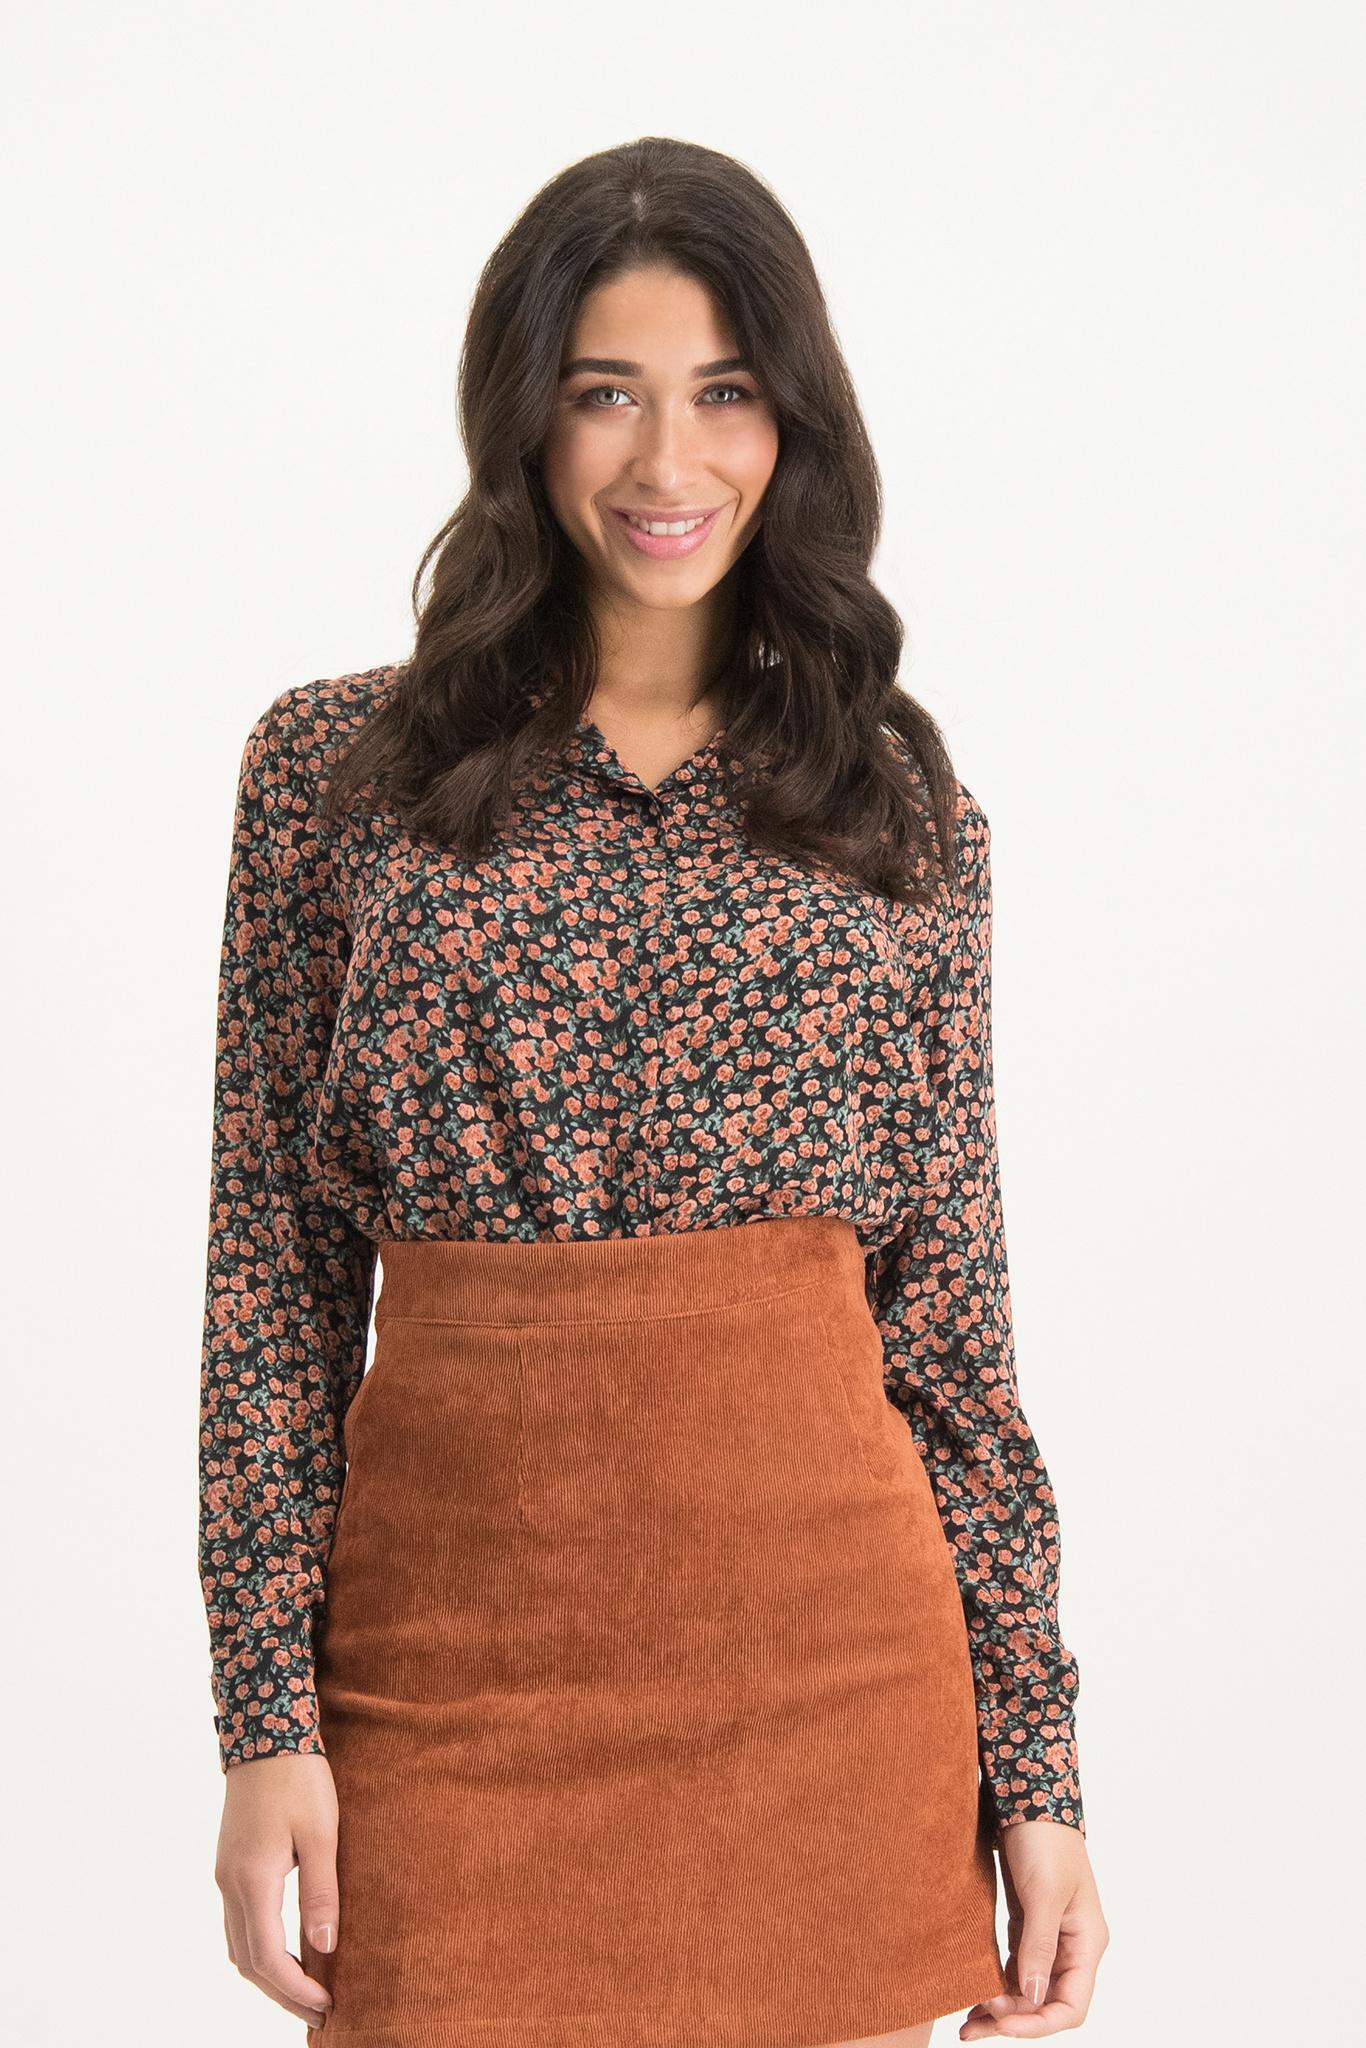 LM Davina Blouse Black Orange Flowers